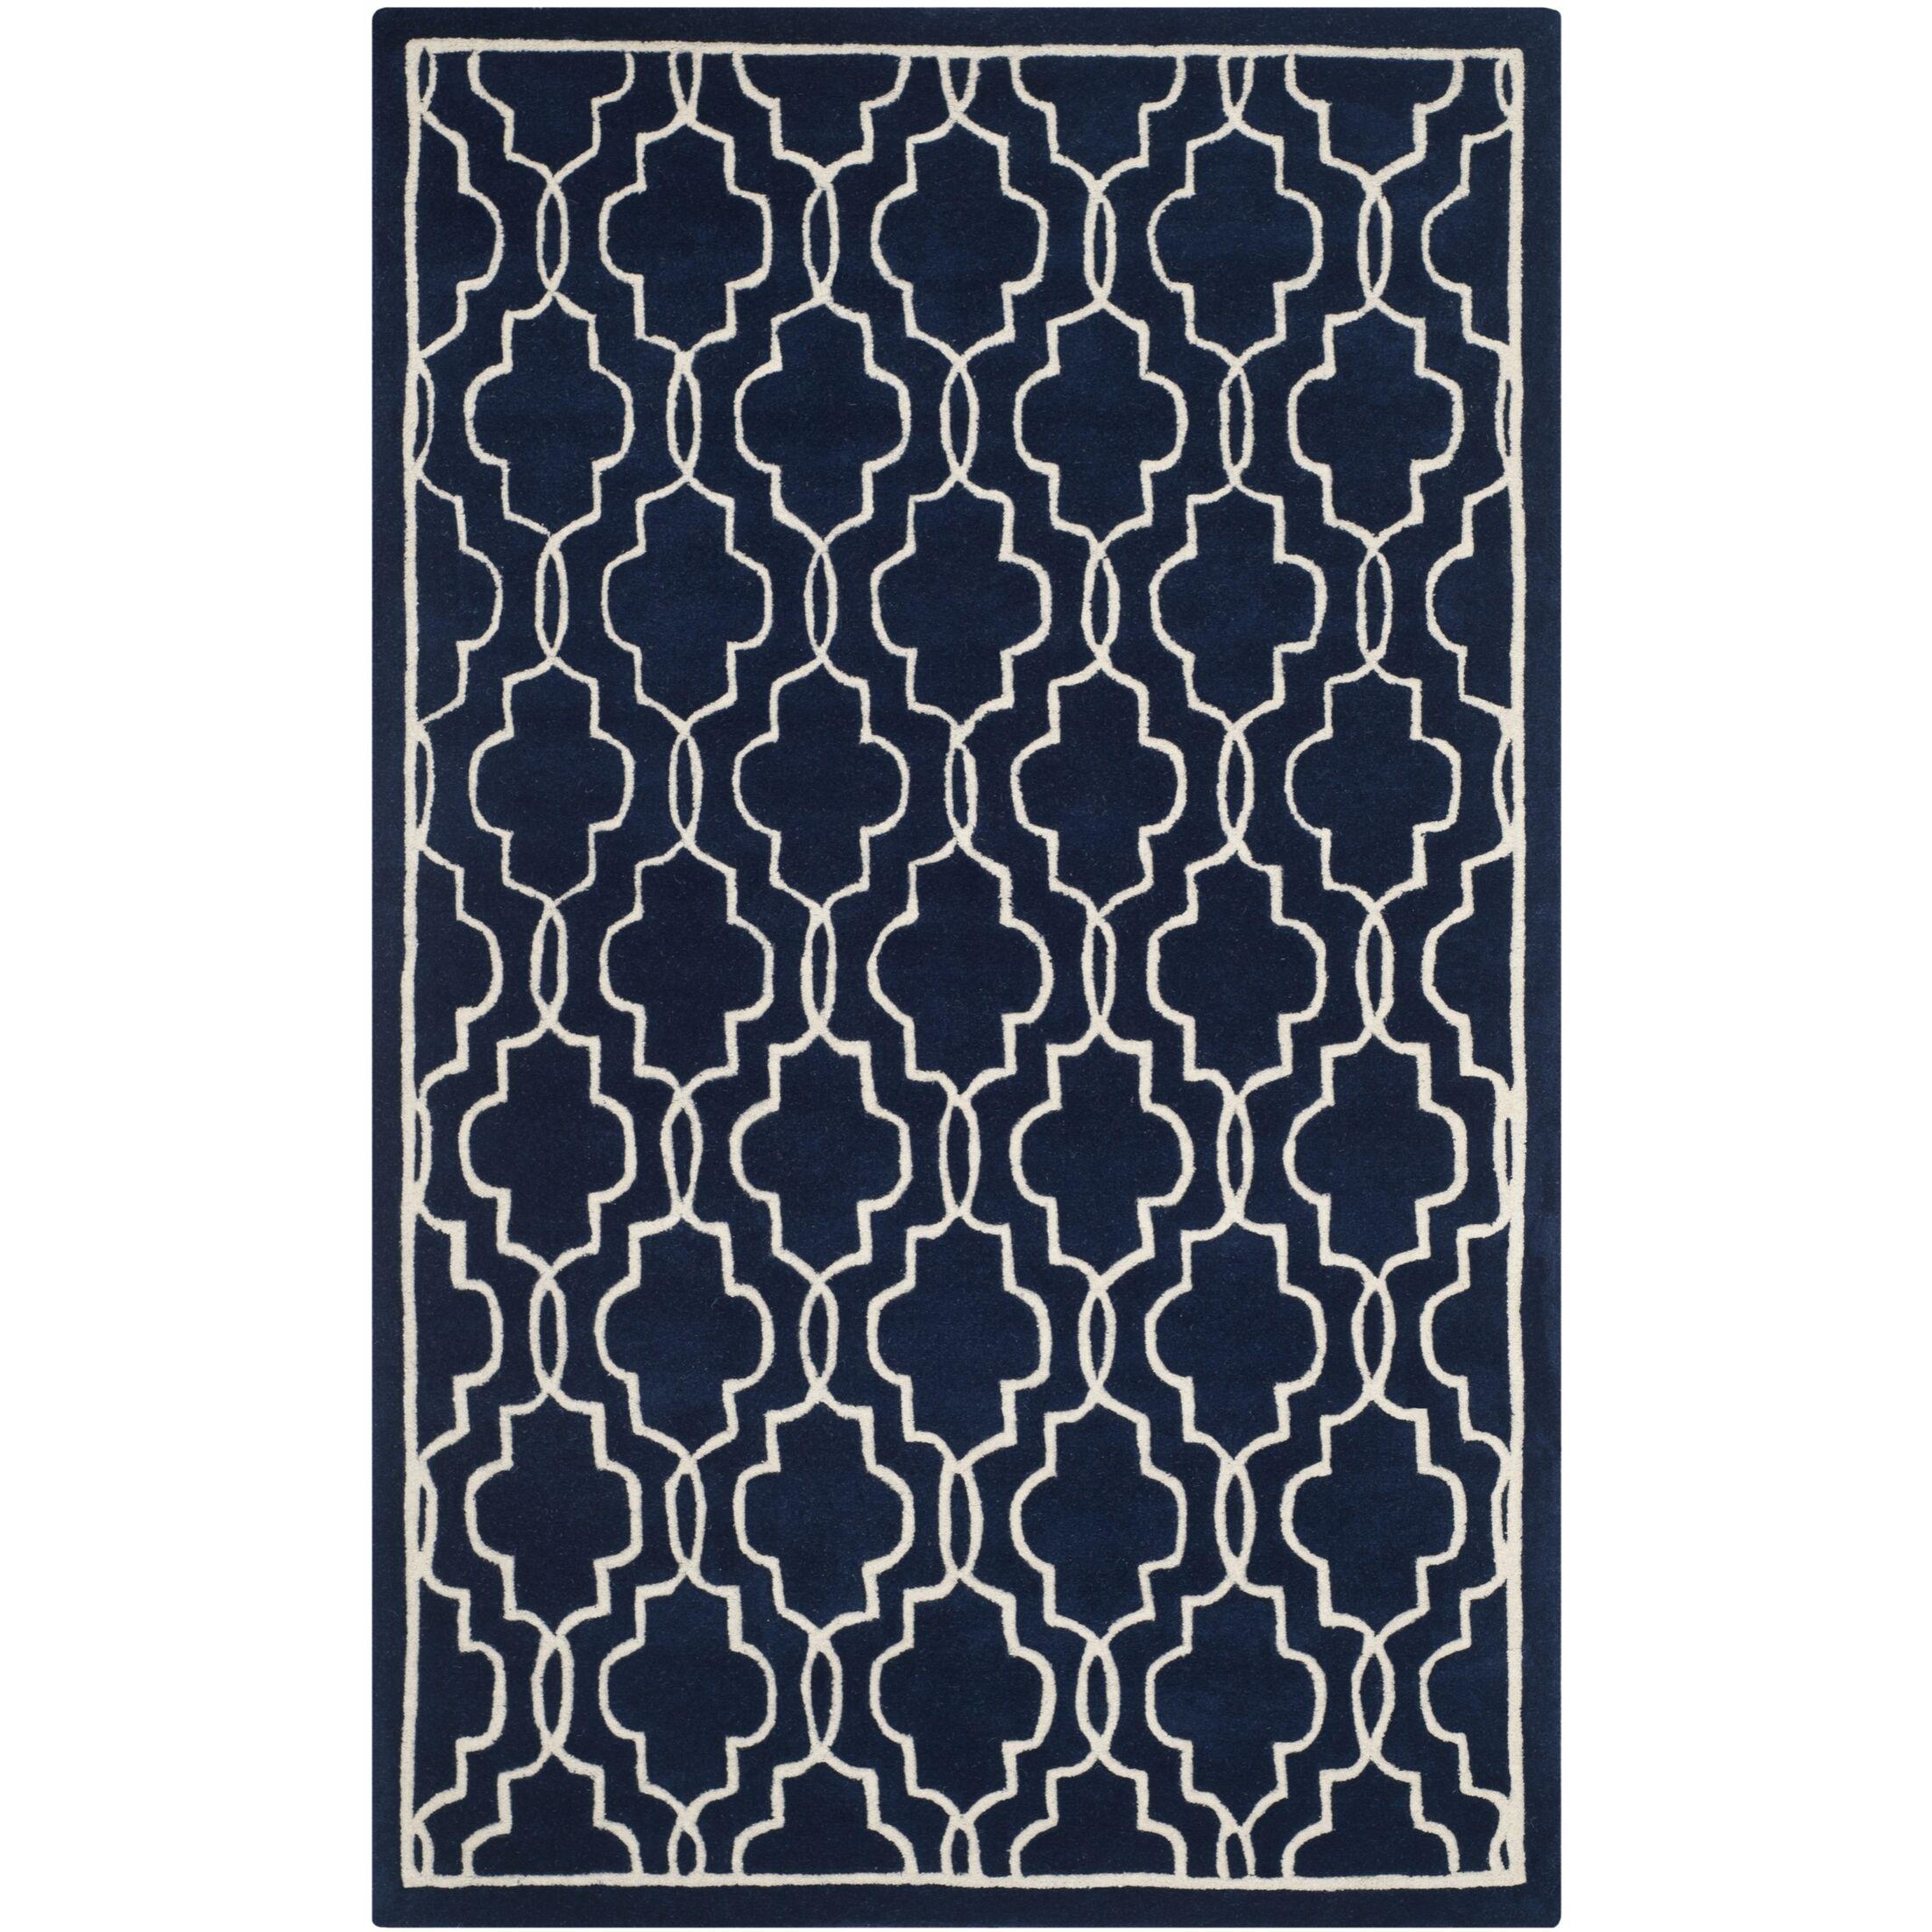 Wilkin Hand-Woven Dark Blue/Ivory Area Rug Rug Size: Rectangle 8' x 10'